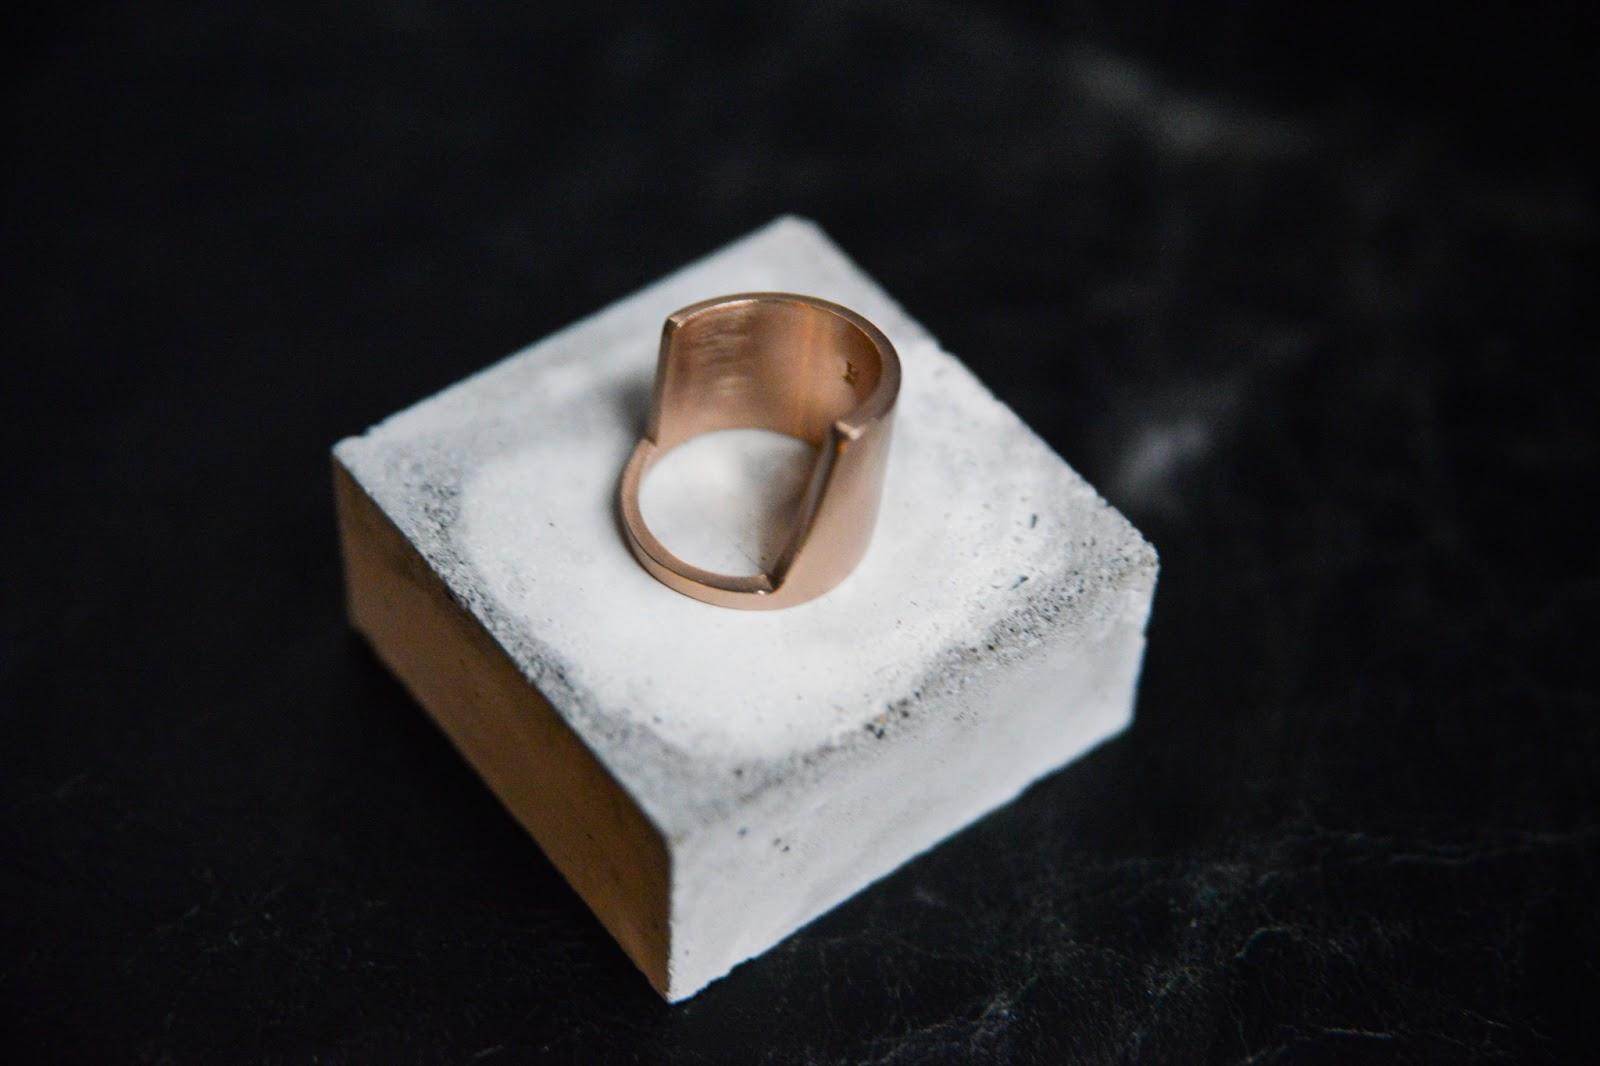 mybelonging-lzzr-jewelry-identity-ring-launchevent.jpg